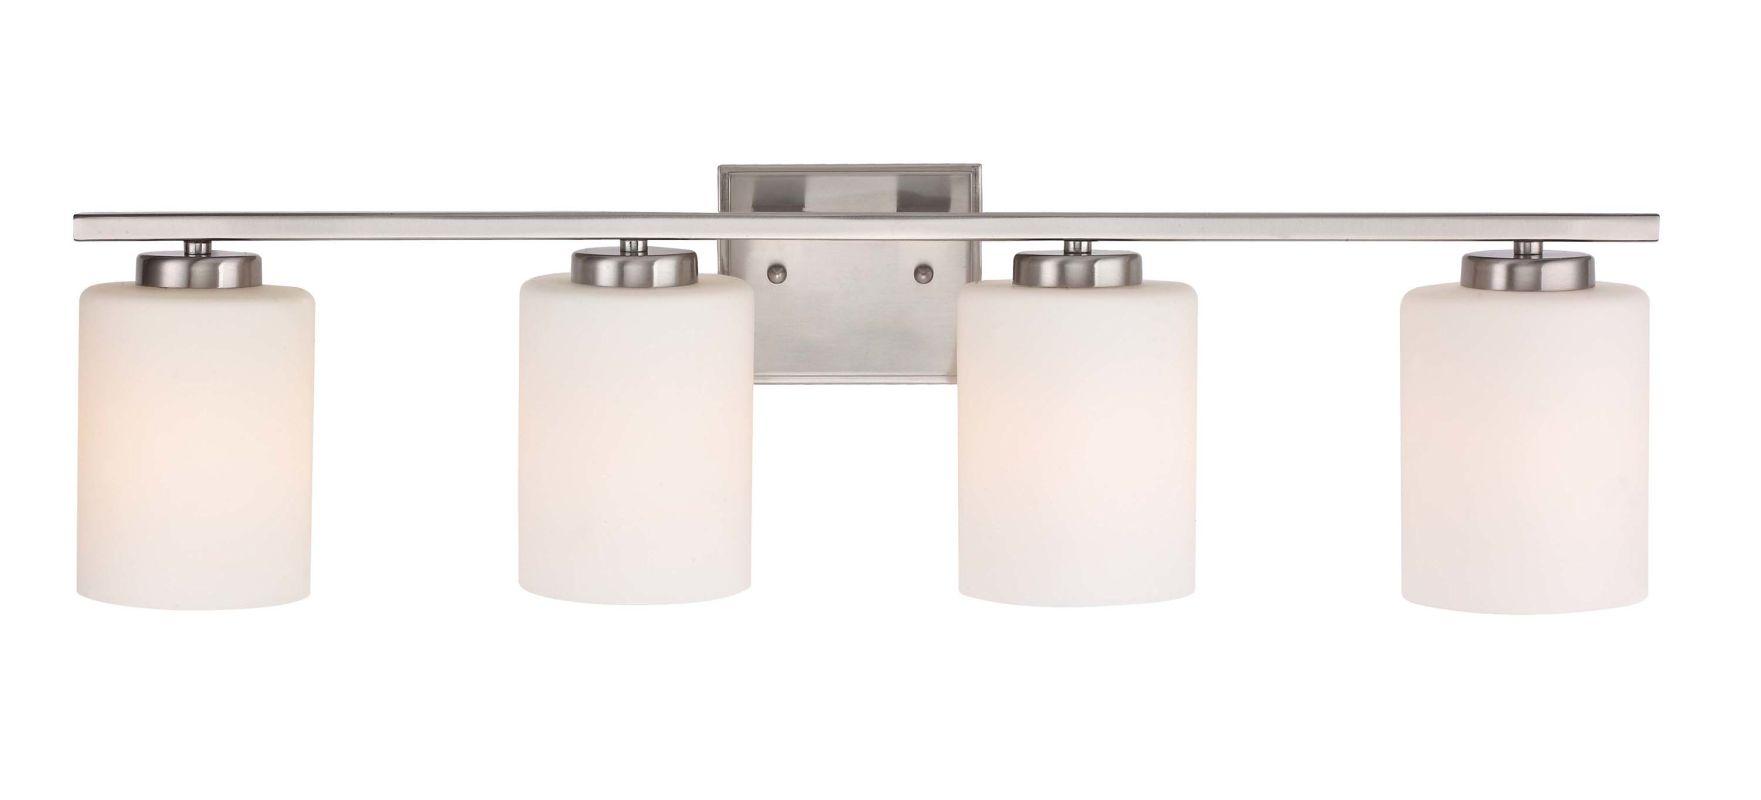 Dolan Designs 3884 4 Light Bathroom Vanity Light - 28.5 Inches Wide